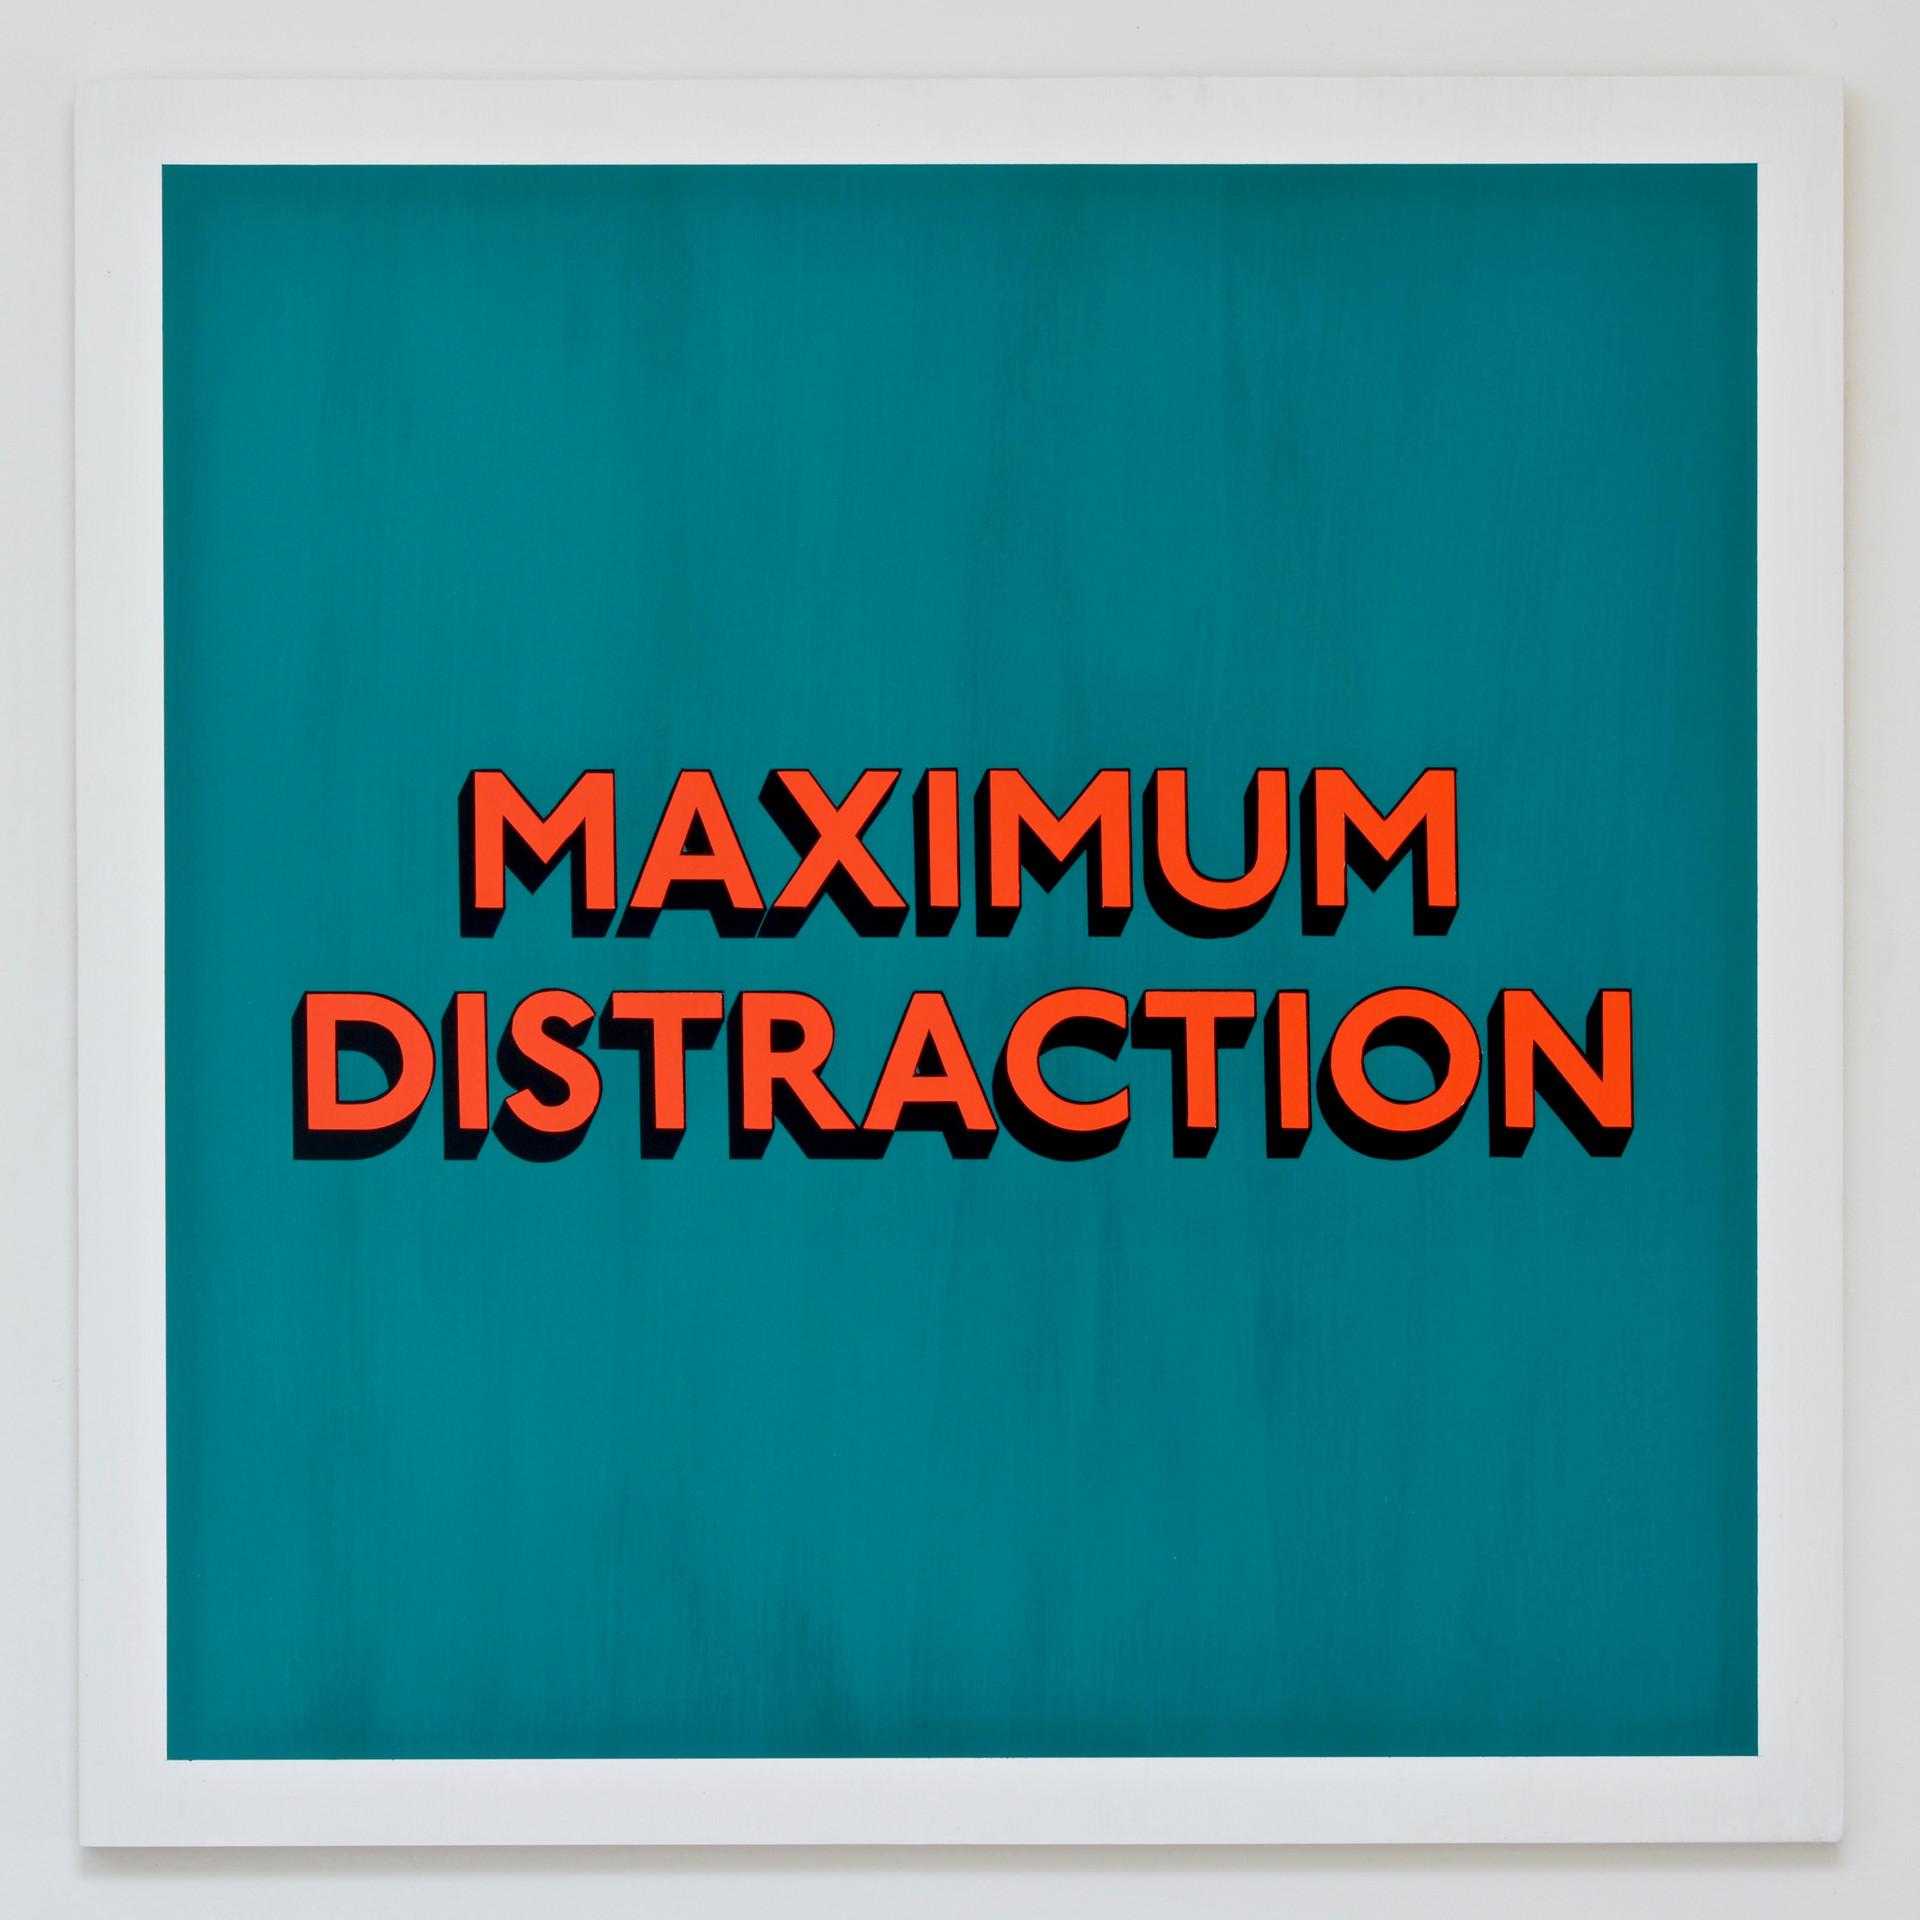 MAXIMUM_DISTRACTION.jpg